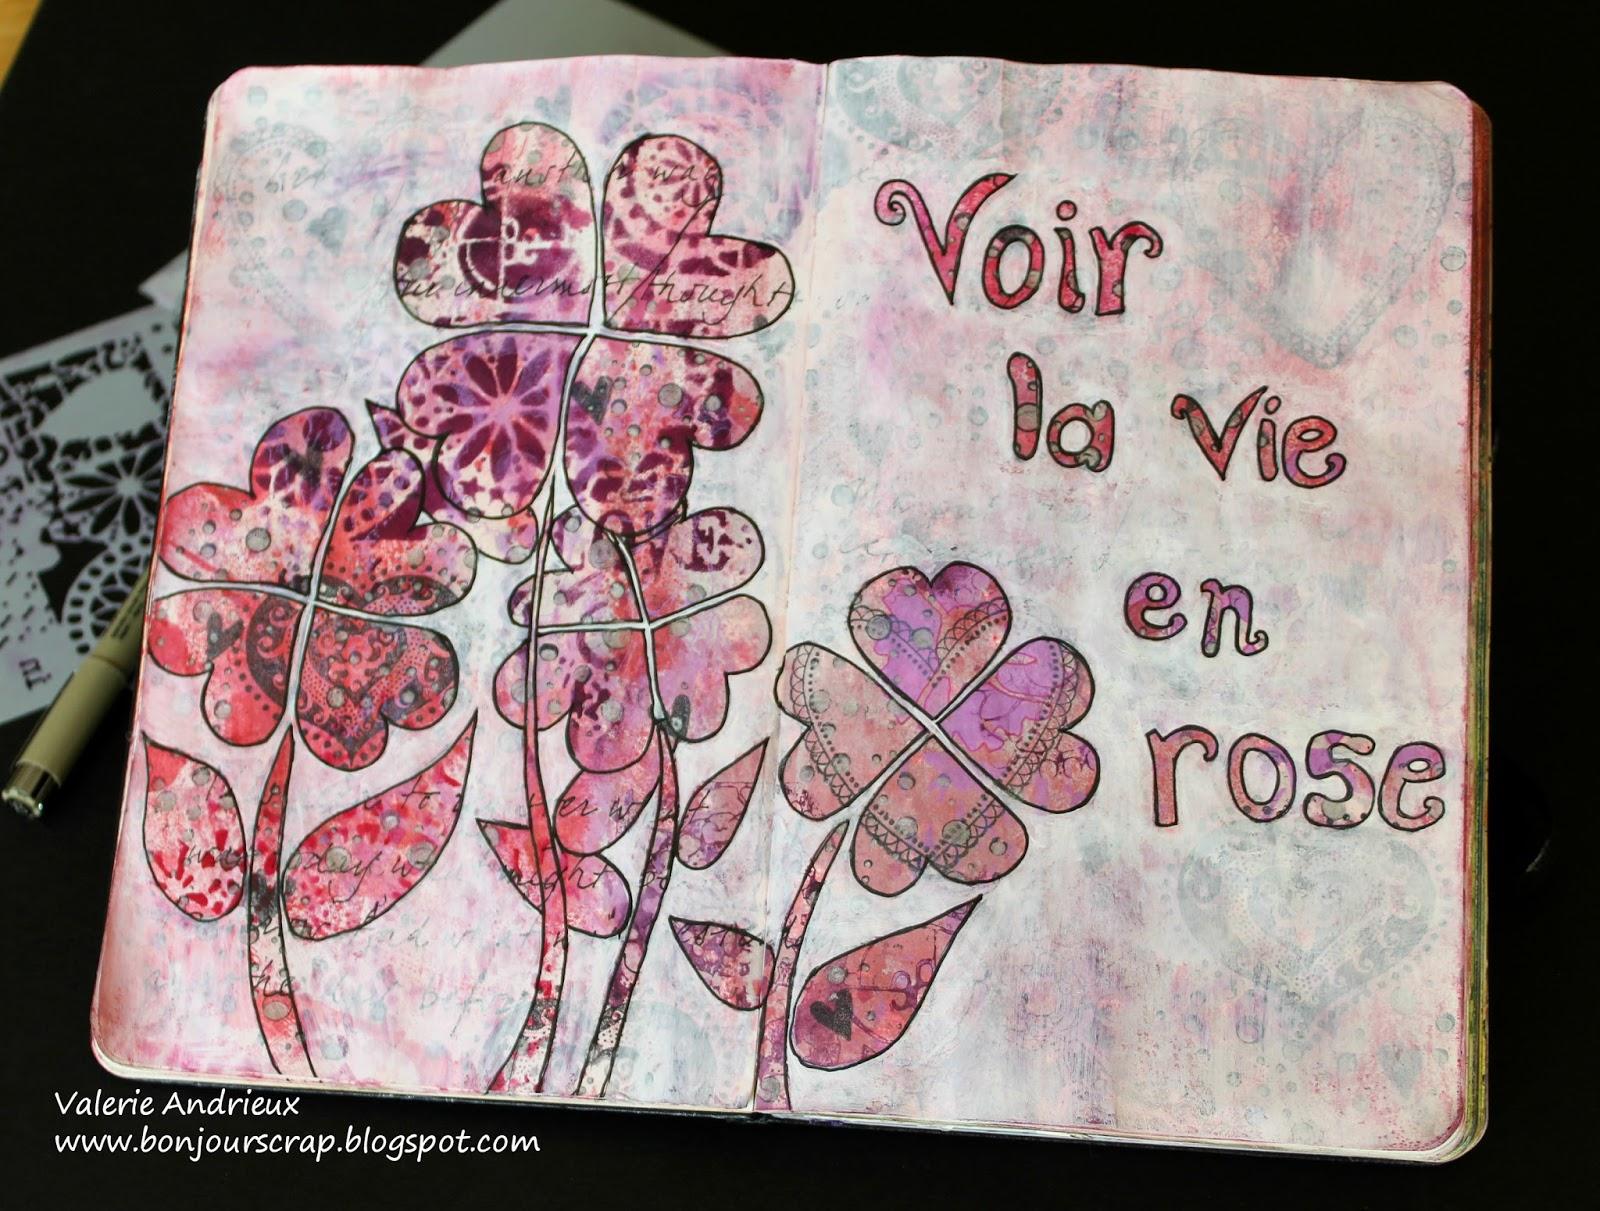 bonjour scrap voir la vie en rose an art journal page spread. Black Bedroom Furniture Sets. Home Design Ideas